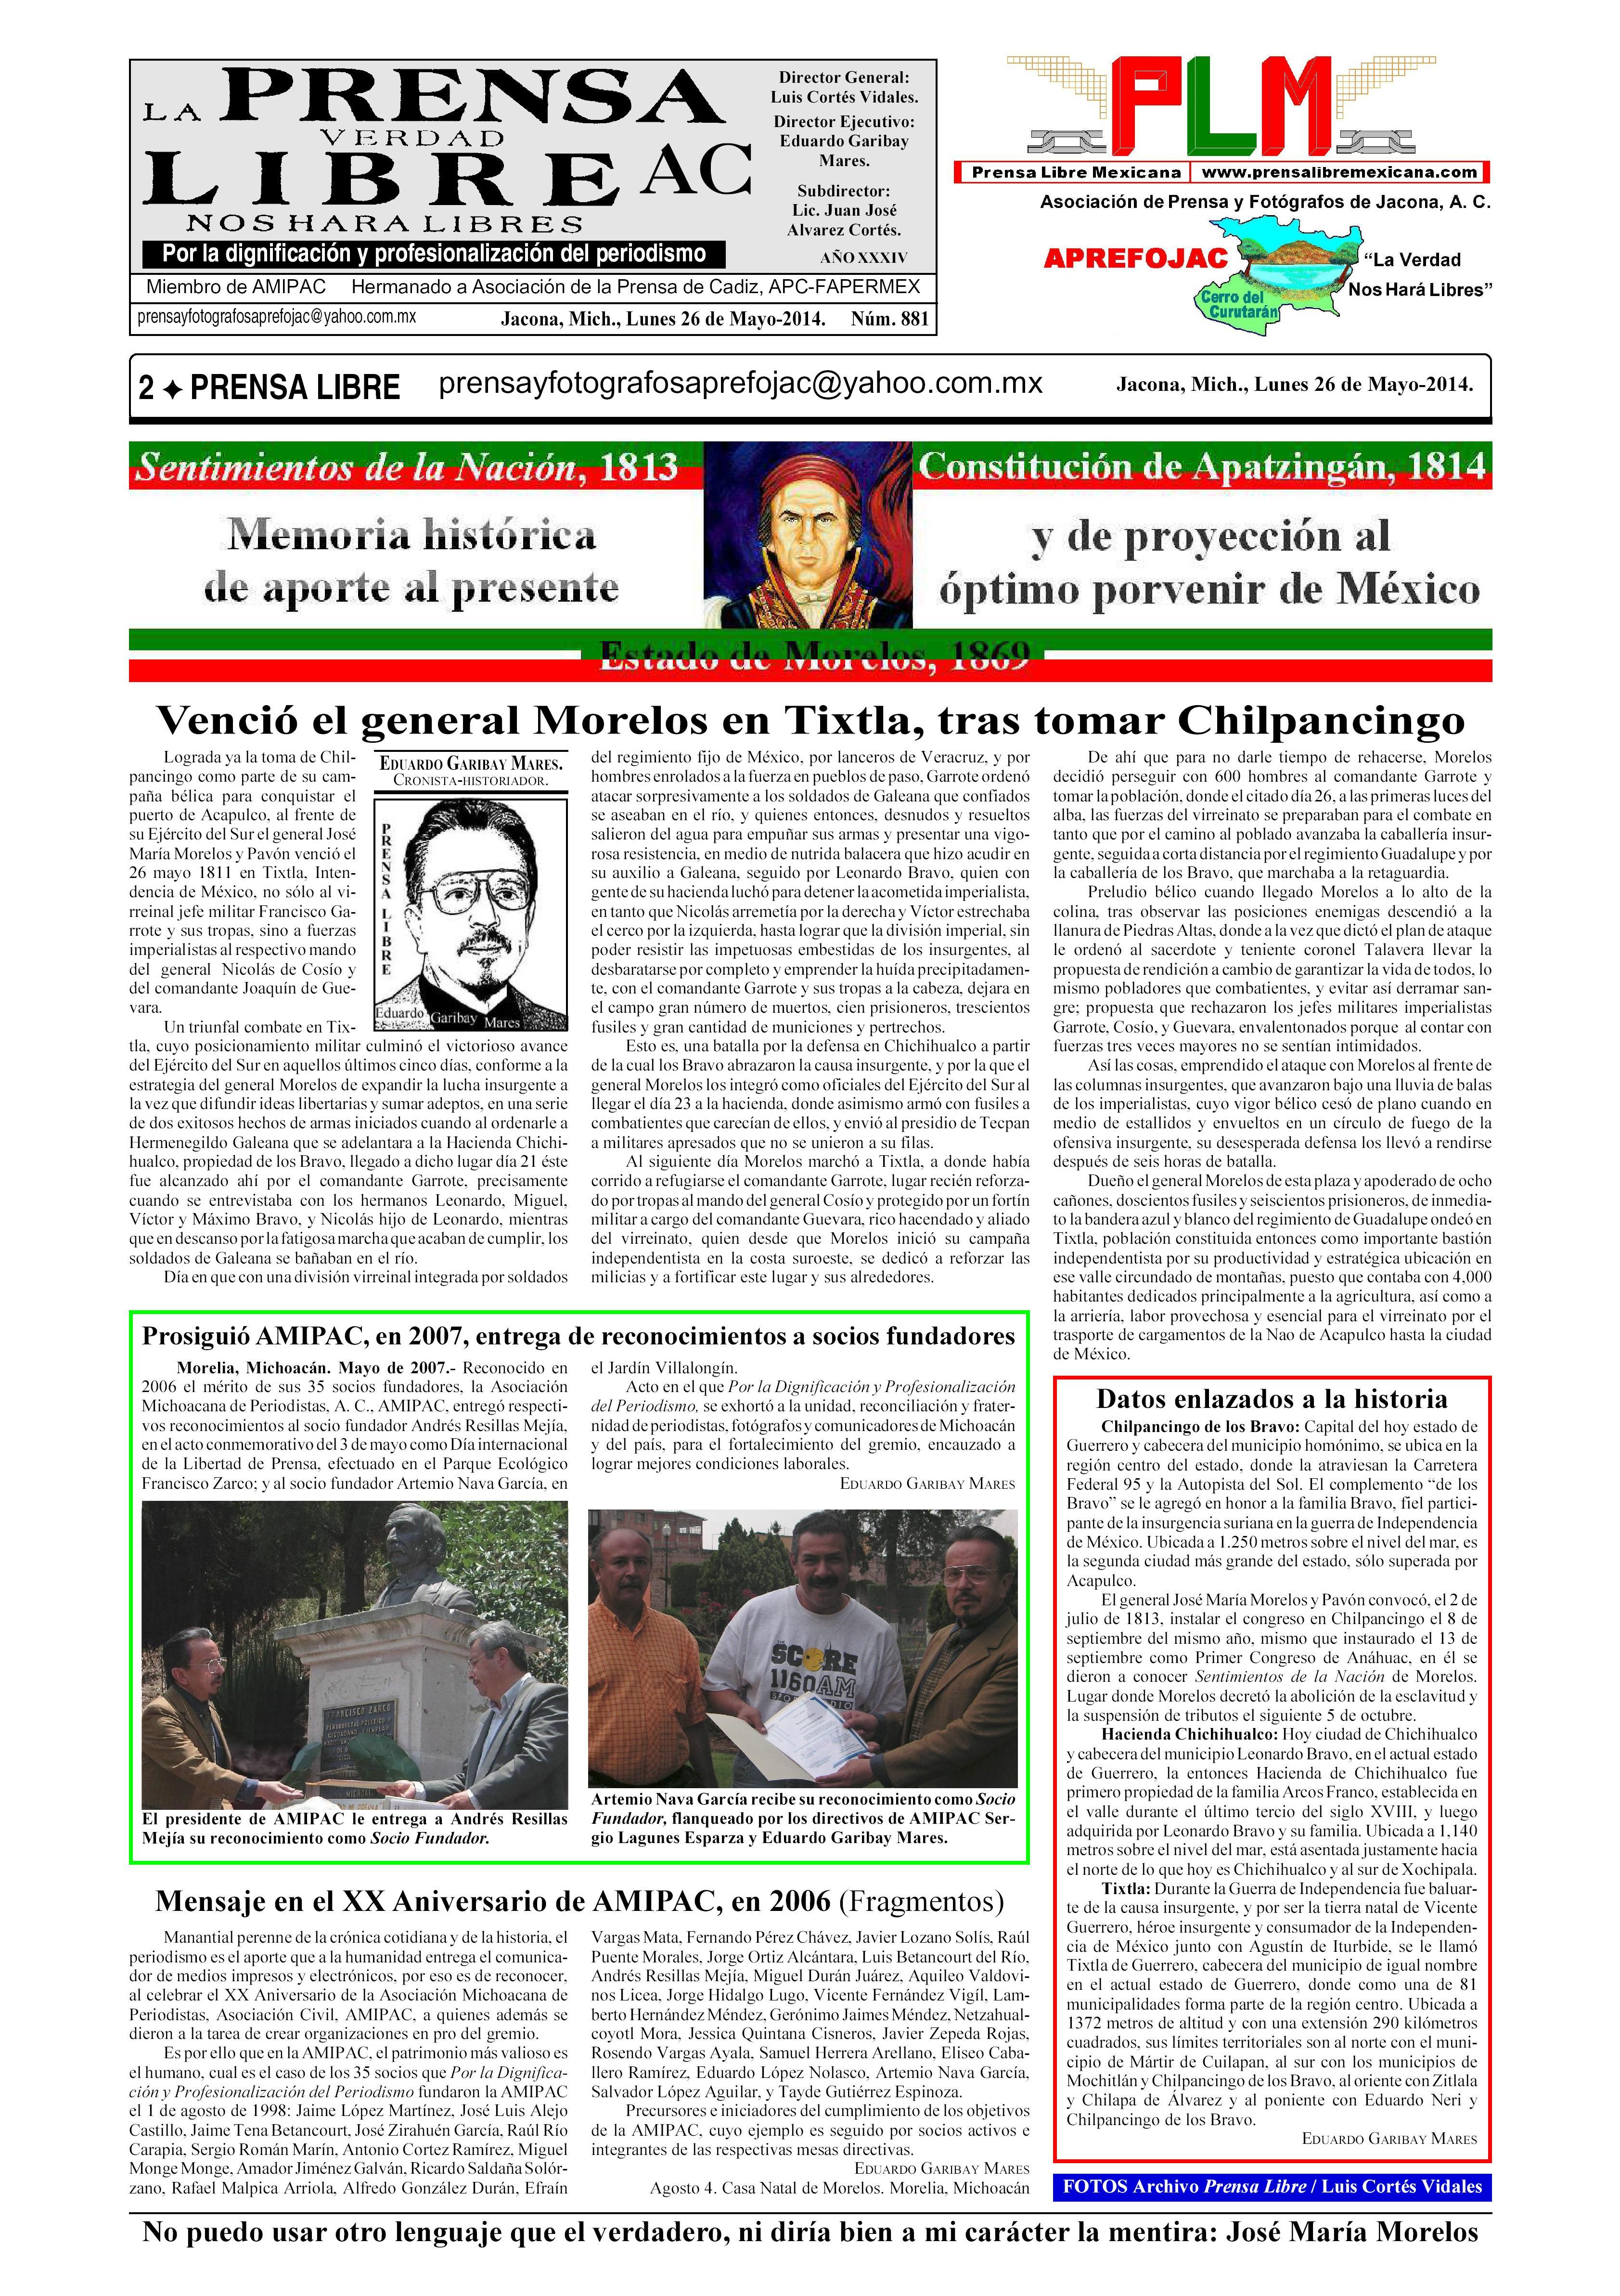 B5b zPrensaLibreNo.881 Pagina2 APREFOJAC